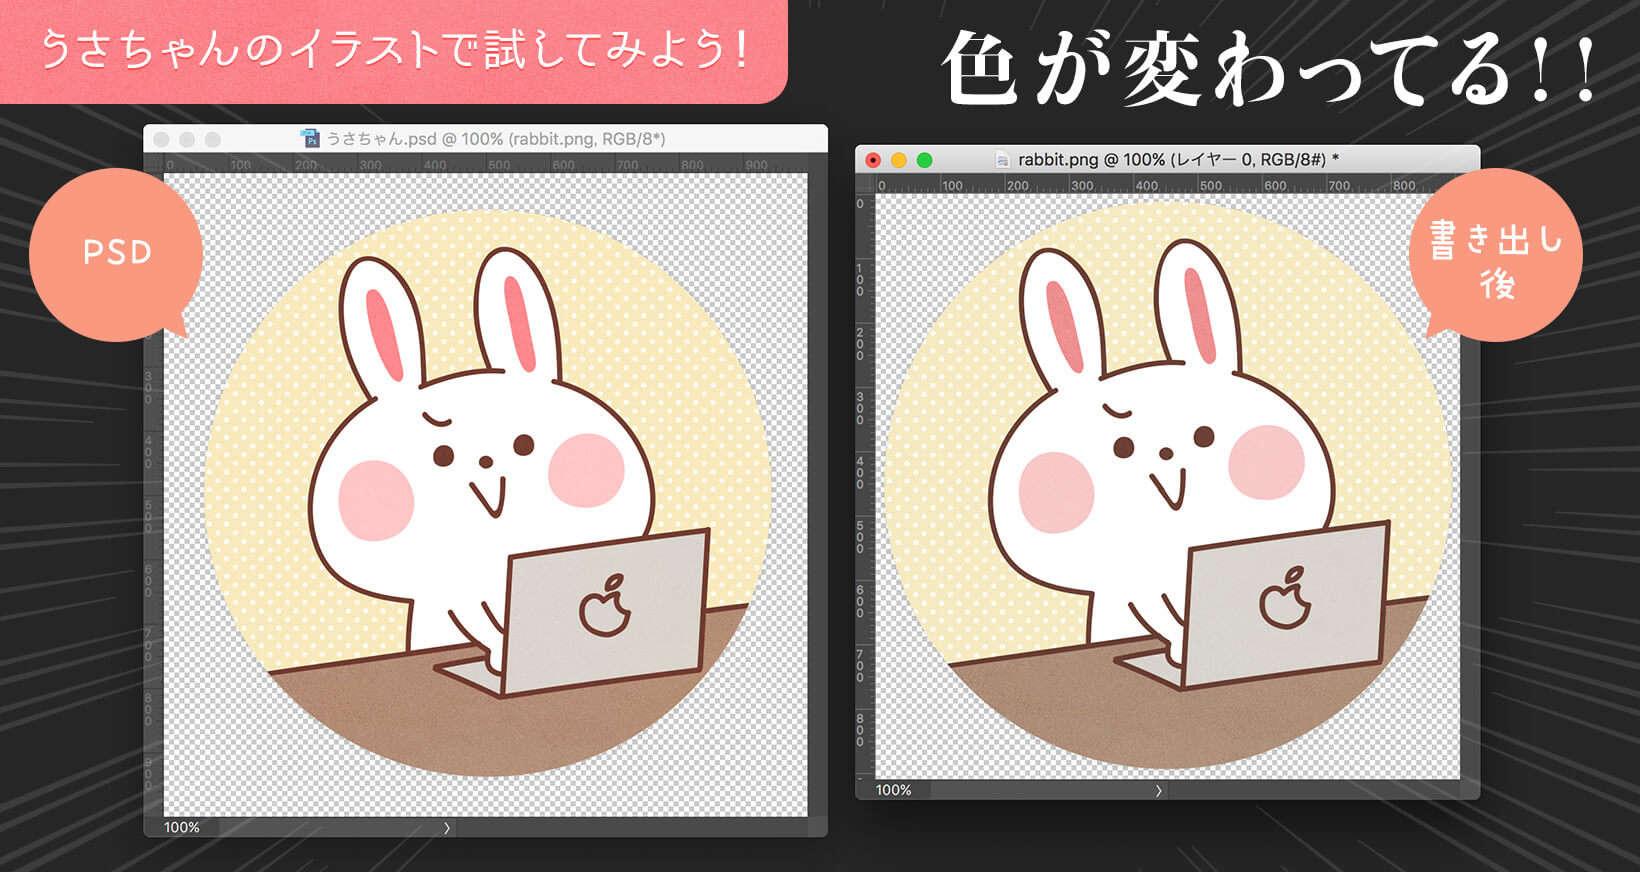 Photoshop WEB用保存 画像アセット 書き出し 色が変わる